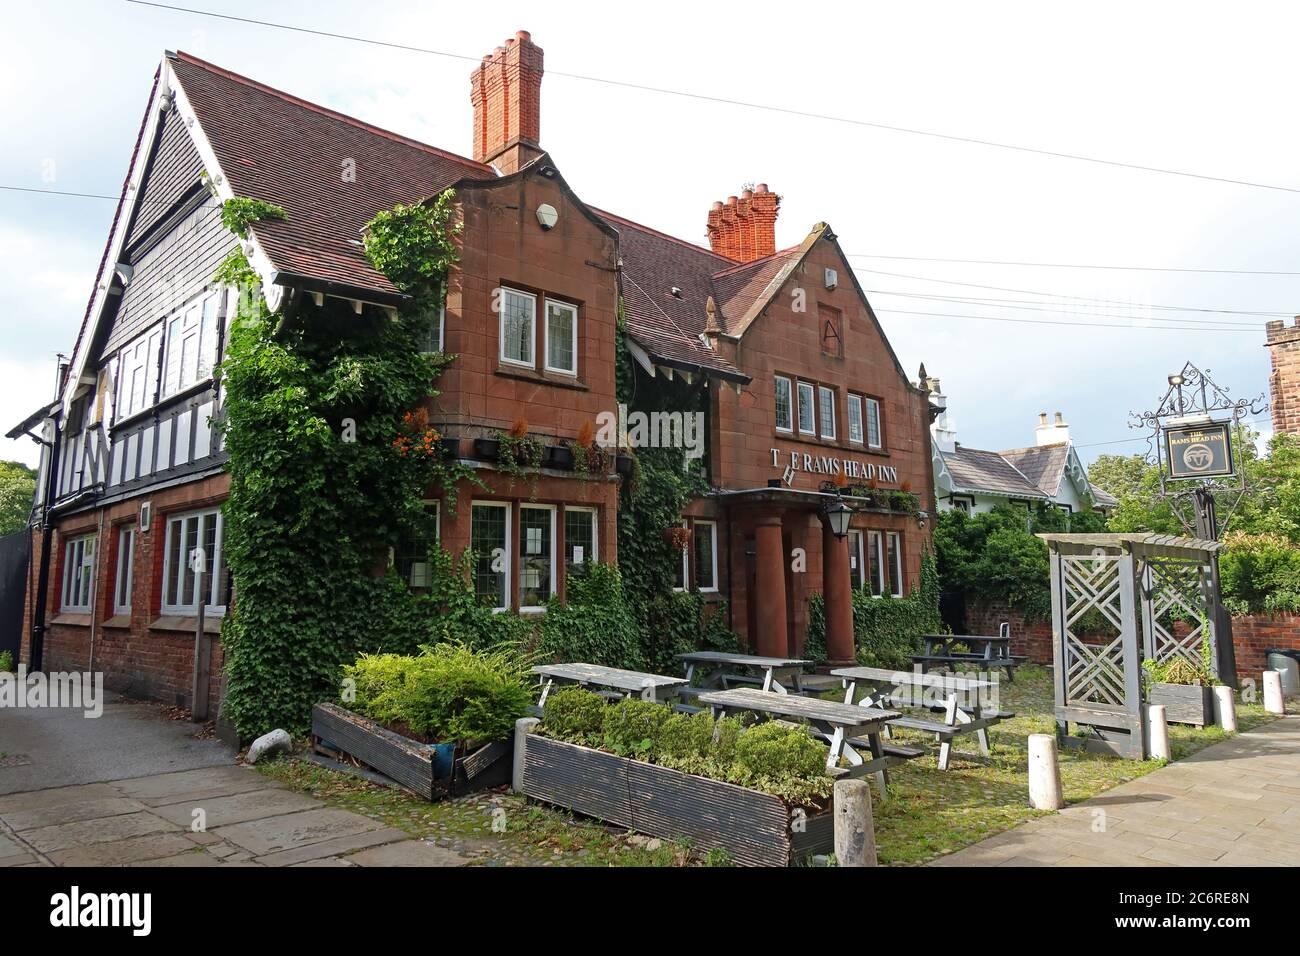 Dieses Stockfoto: Das Rams Head Inn, Church Lane, Grappenhall Village, Warrington, Cheshire, England, Großbritannien, WA4 3EP - 2C6RE8